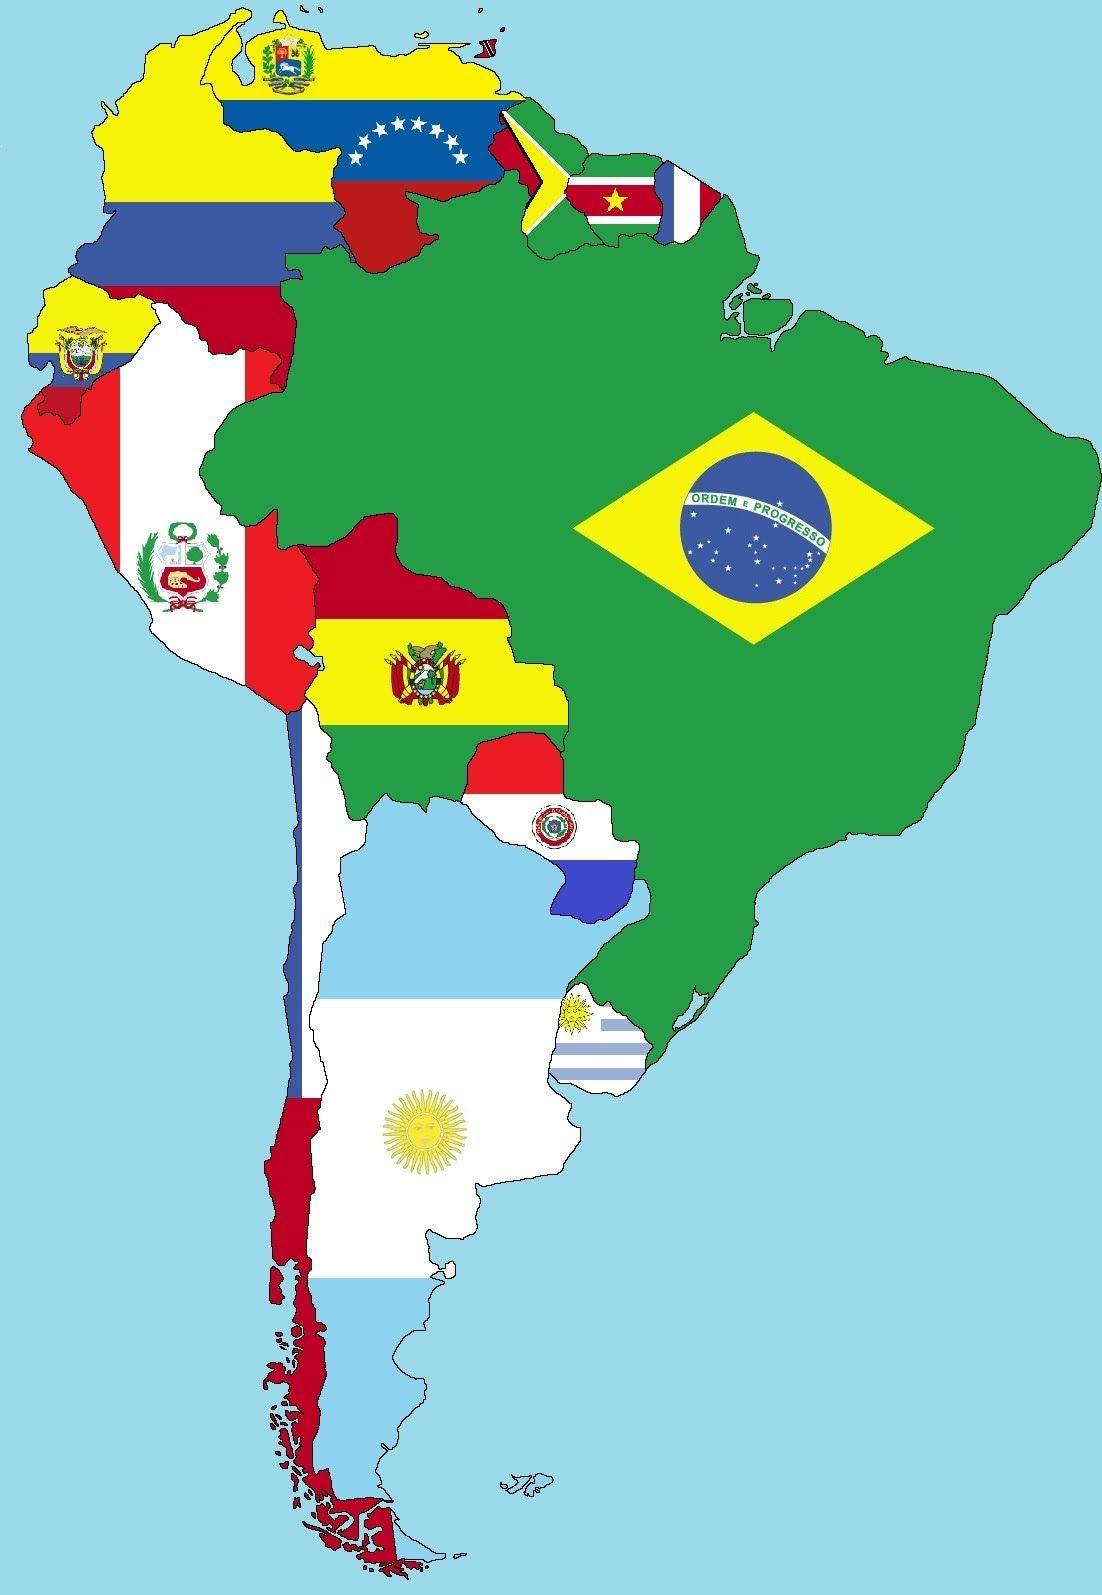 Mapa De America Del Sur Google Search Mapa De America Del Sur Mapa De America Latina Banderas De América Latina